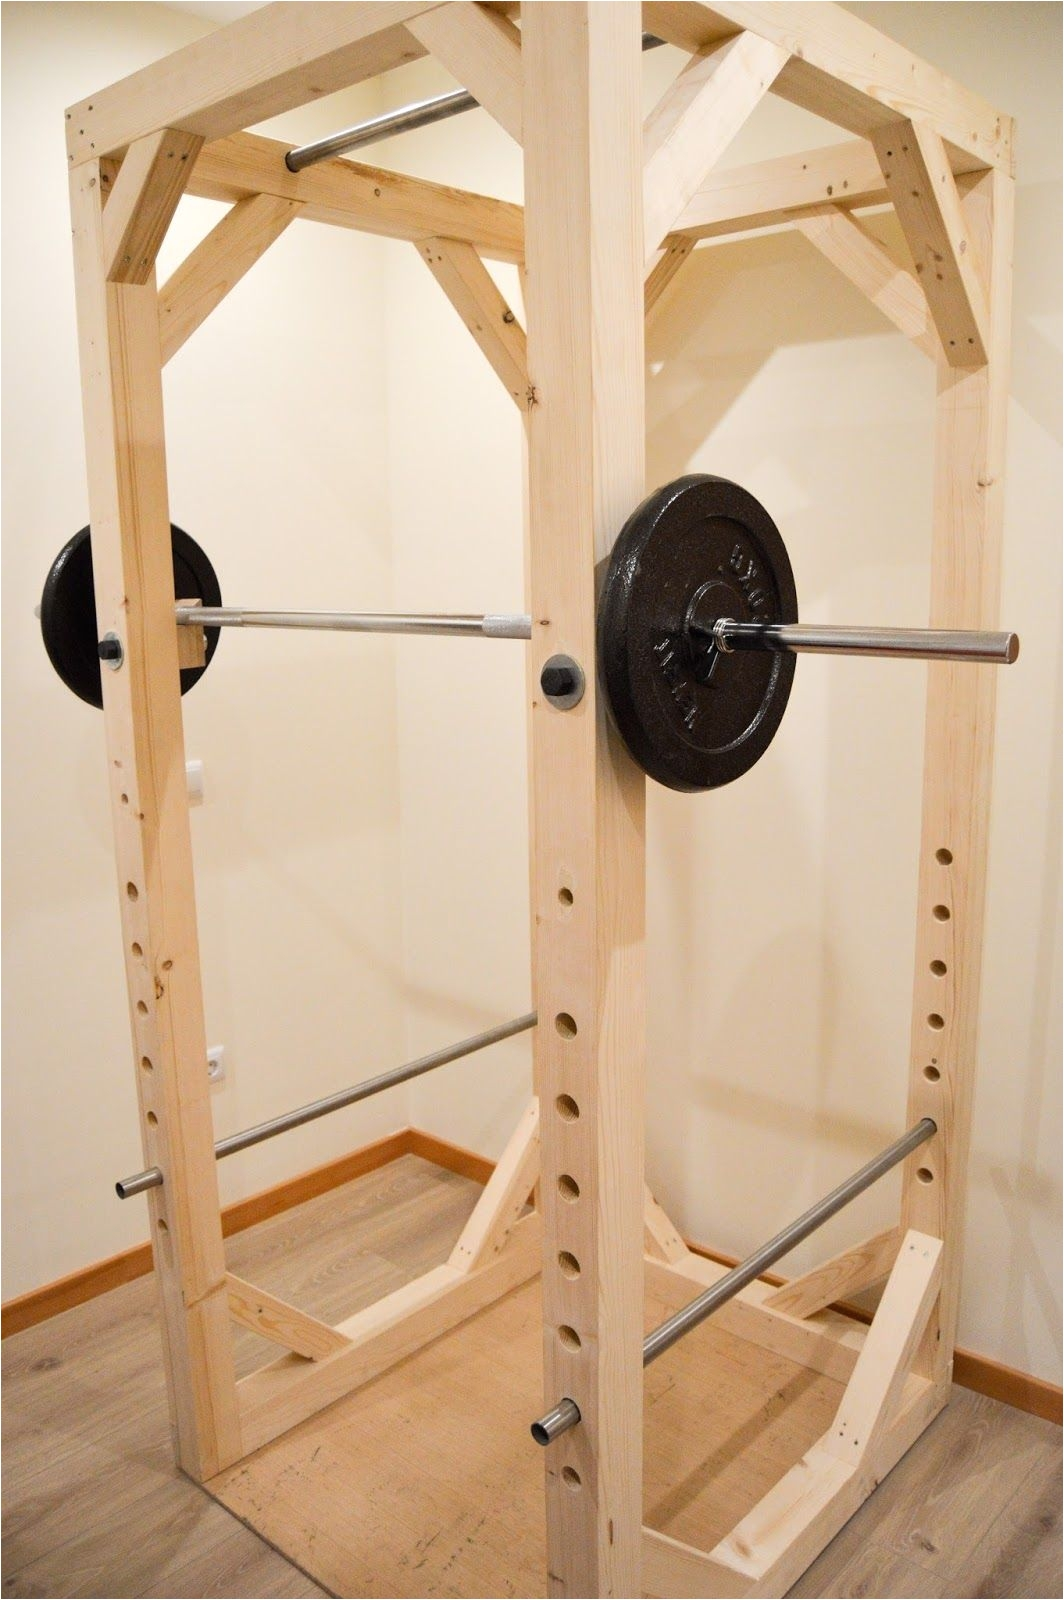 Diy Wooden Squat Rack Plans Homemade Diy Power Rack Iron Add